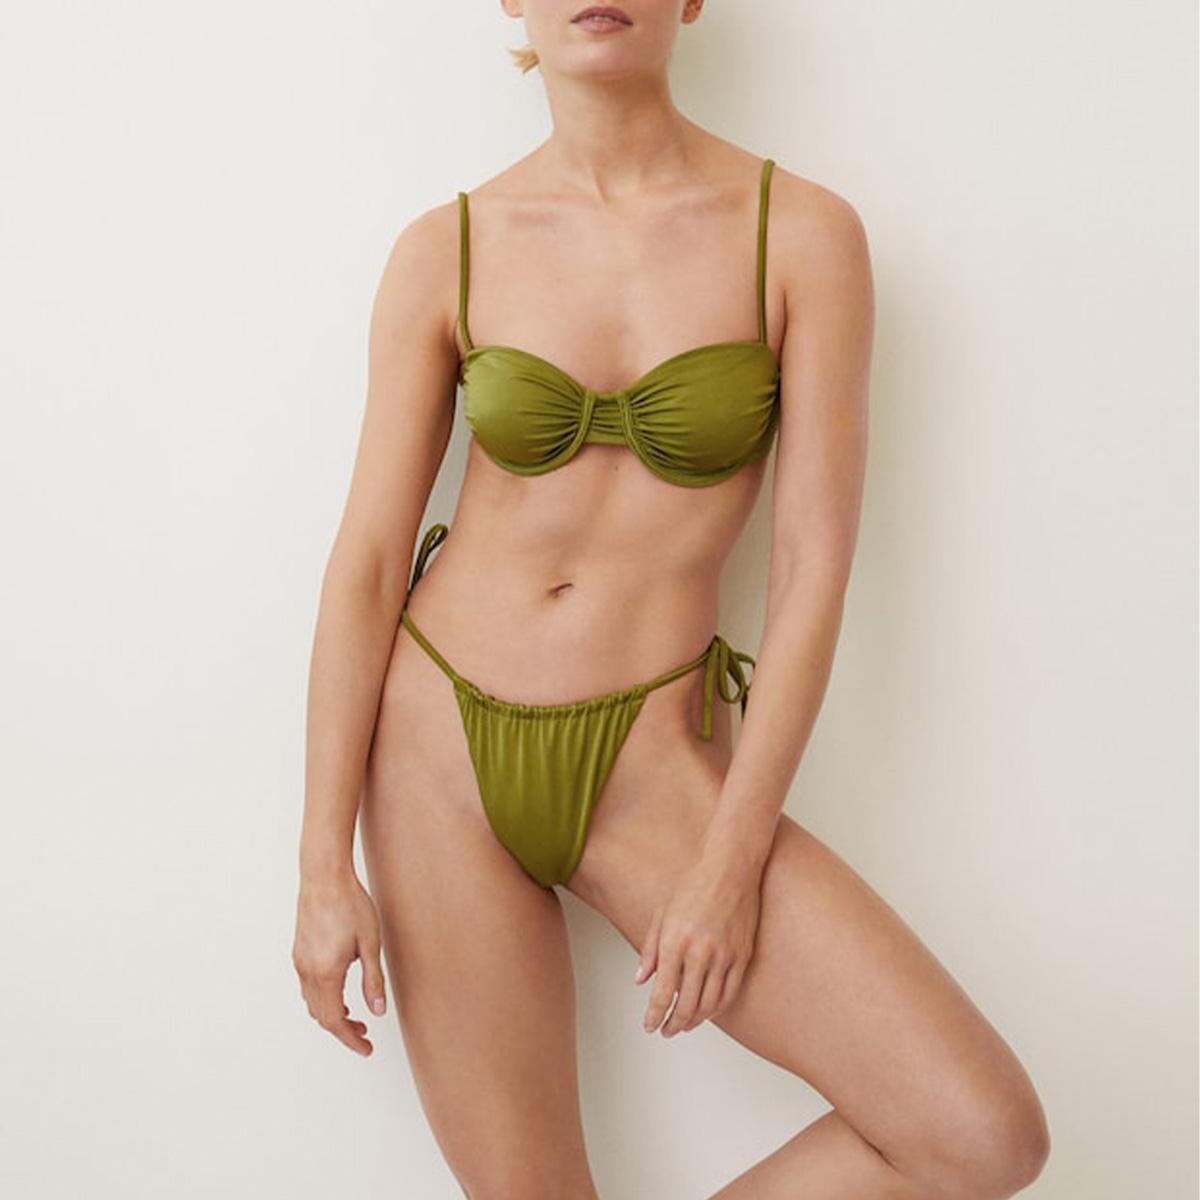 The Timeless Bikini Trend That's Classically Sexy - string bikini trend 294159 1625867104334